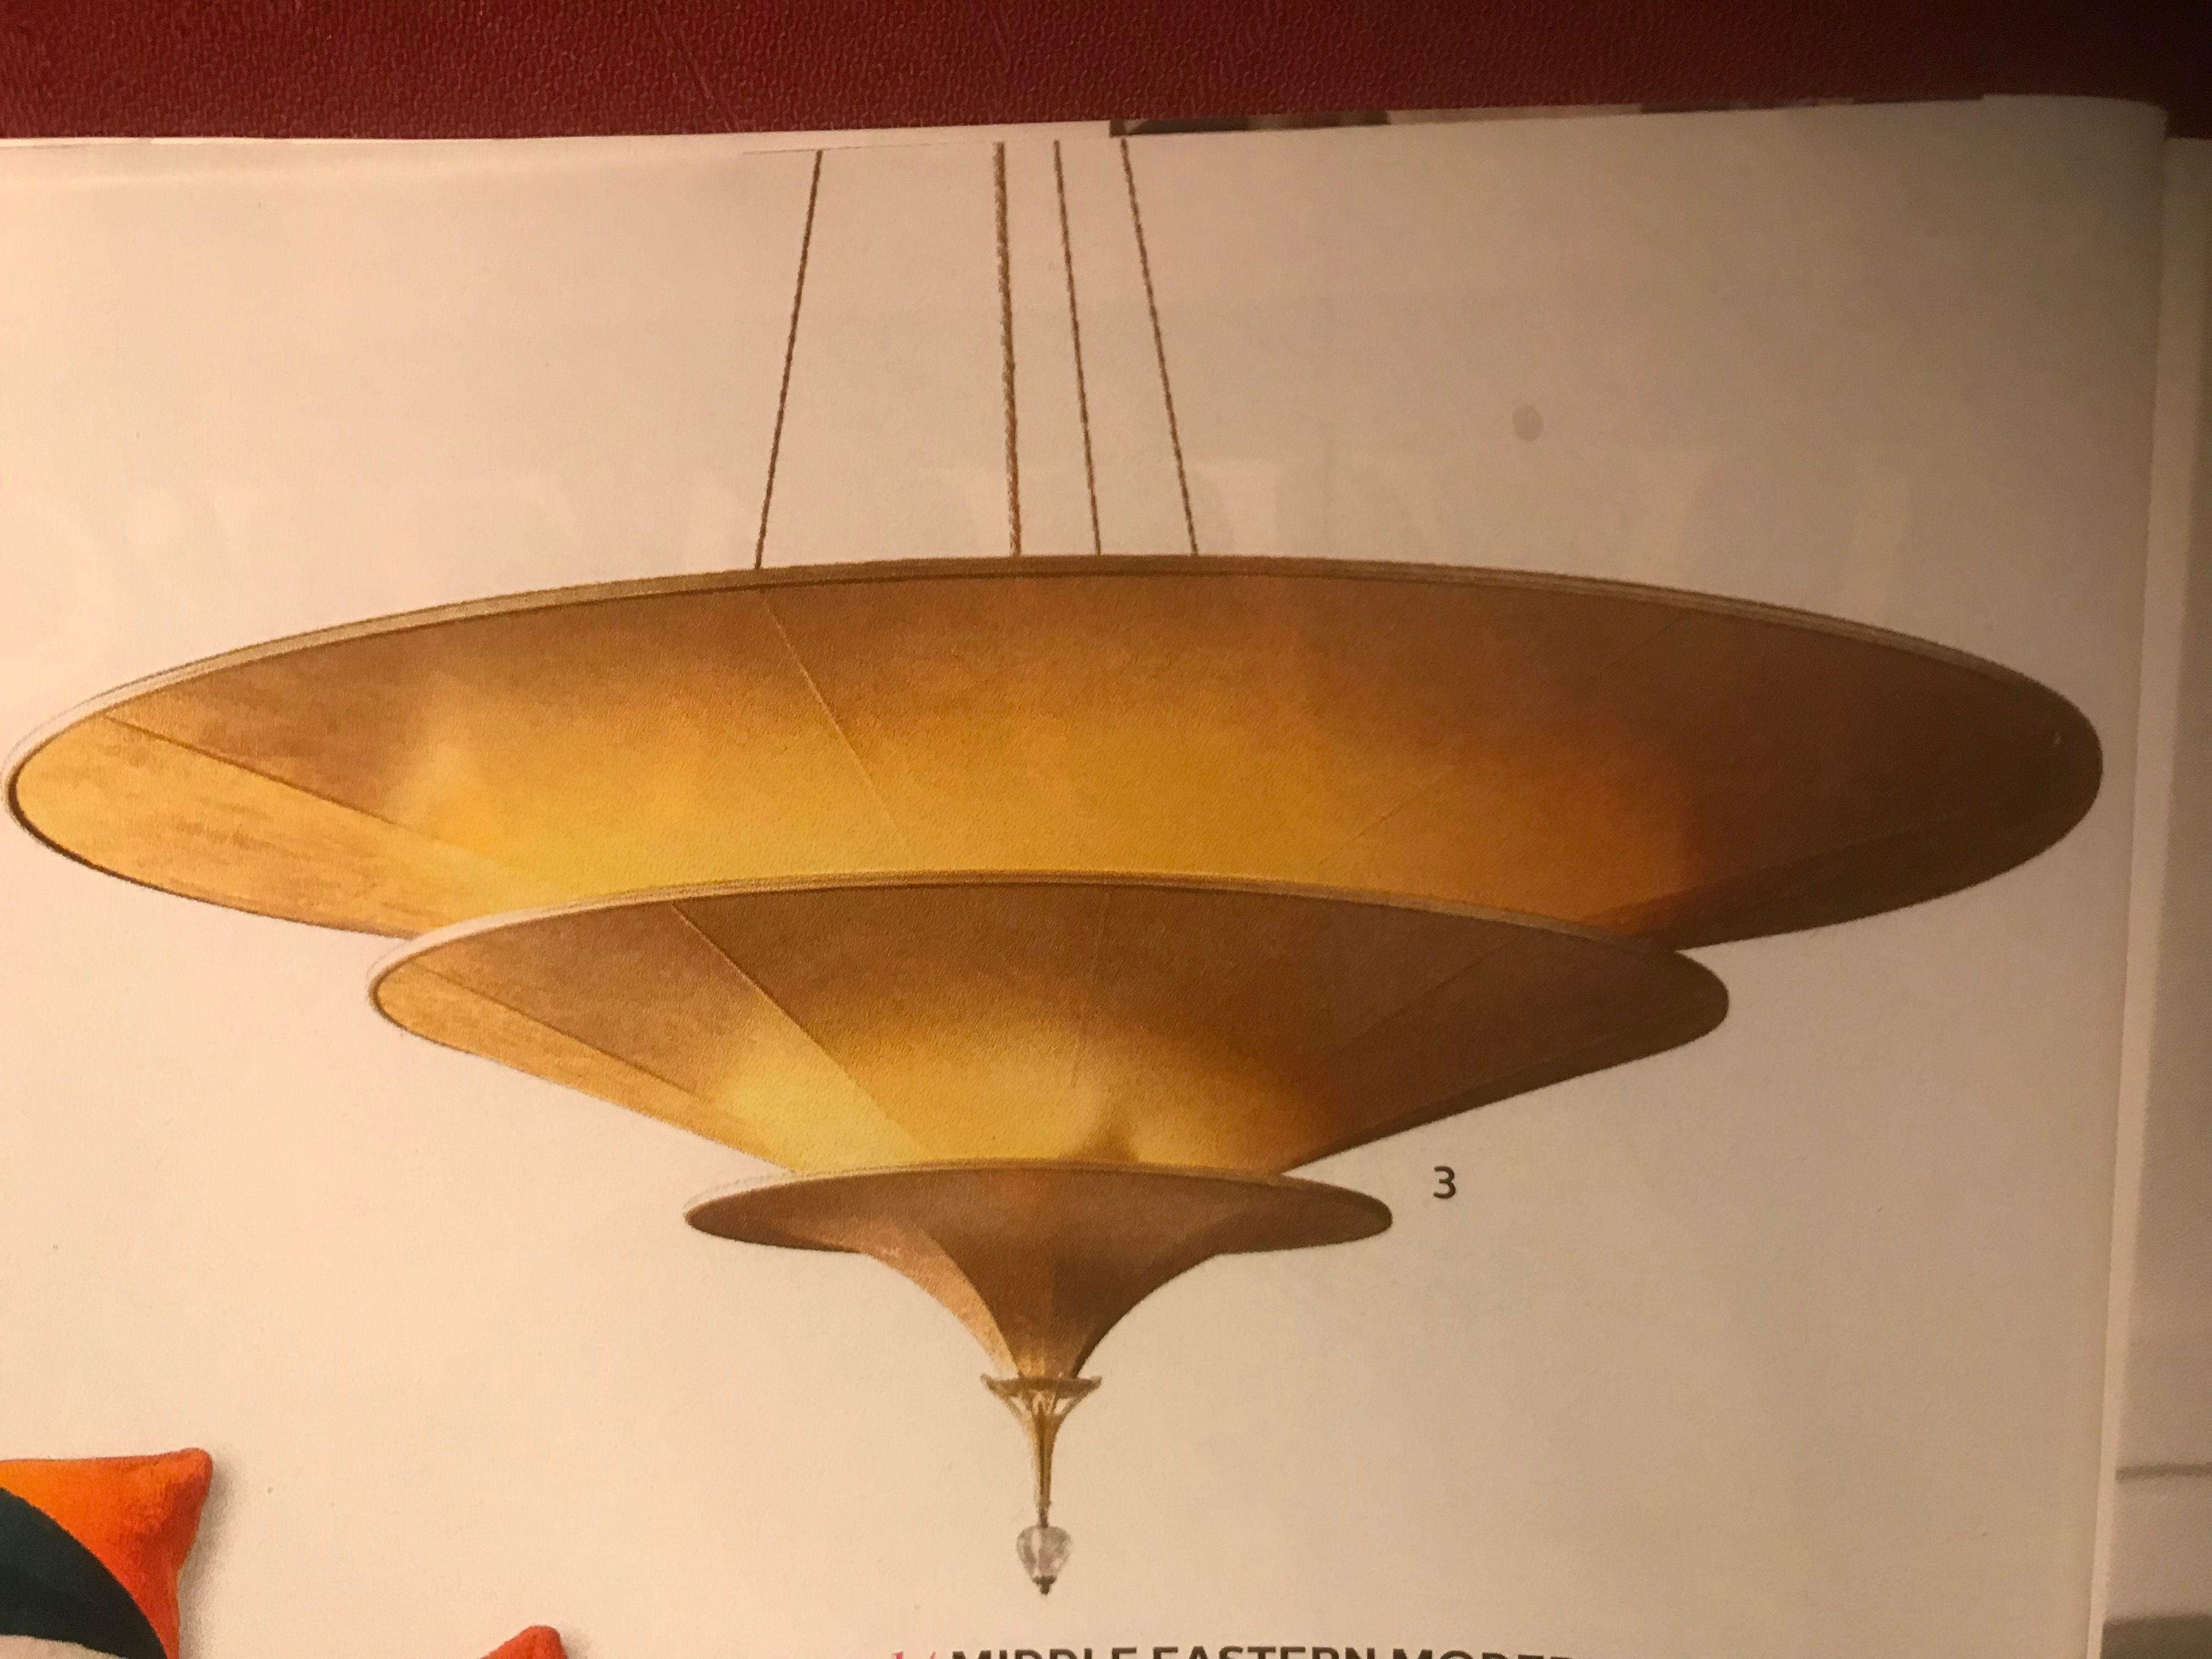 Restoration Hardware Icaro chandelier fiberglass shades